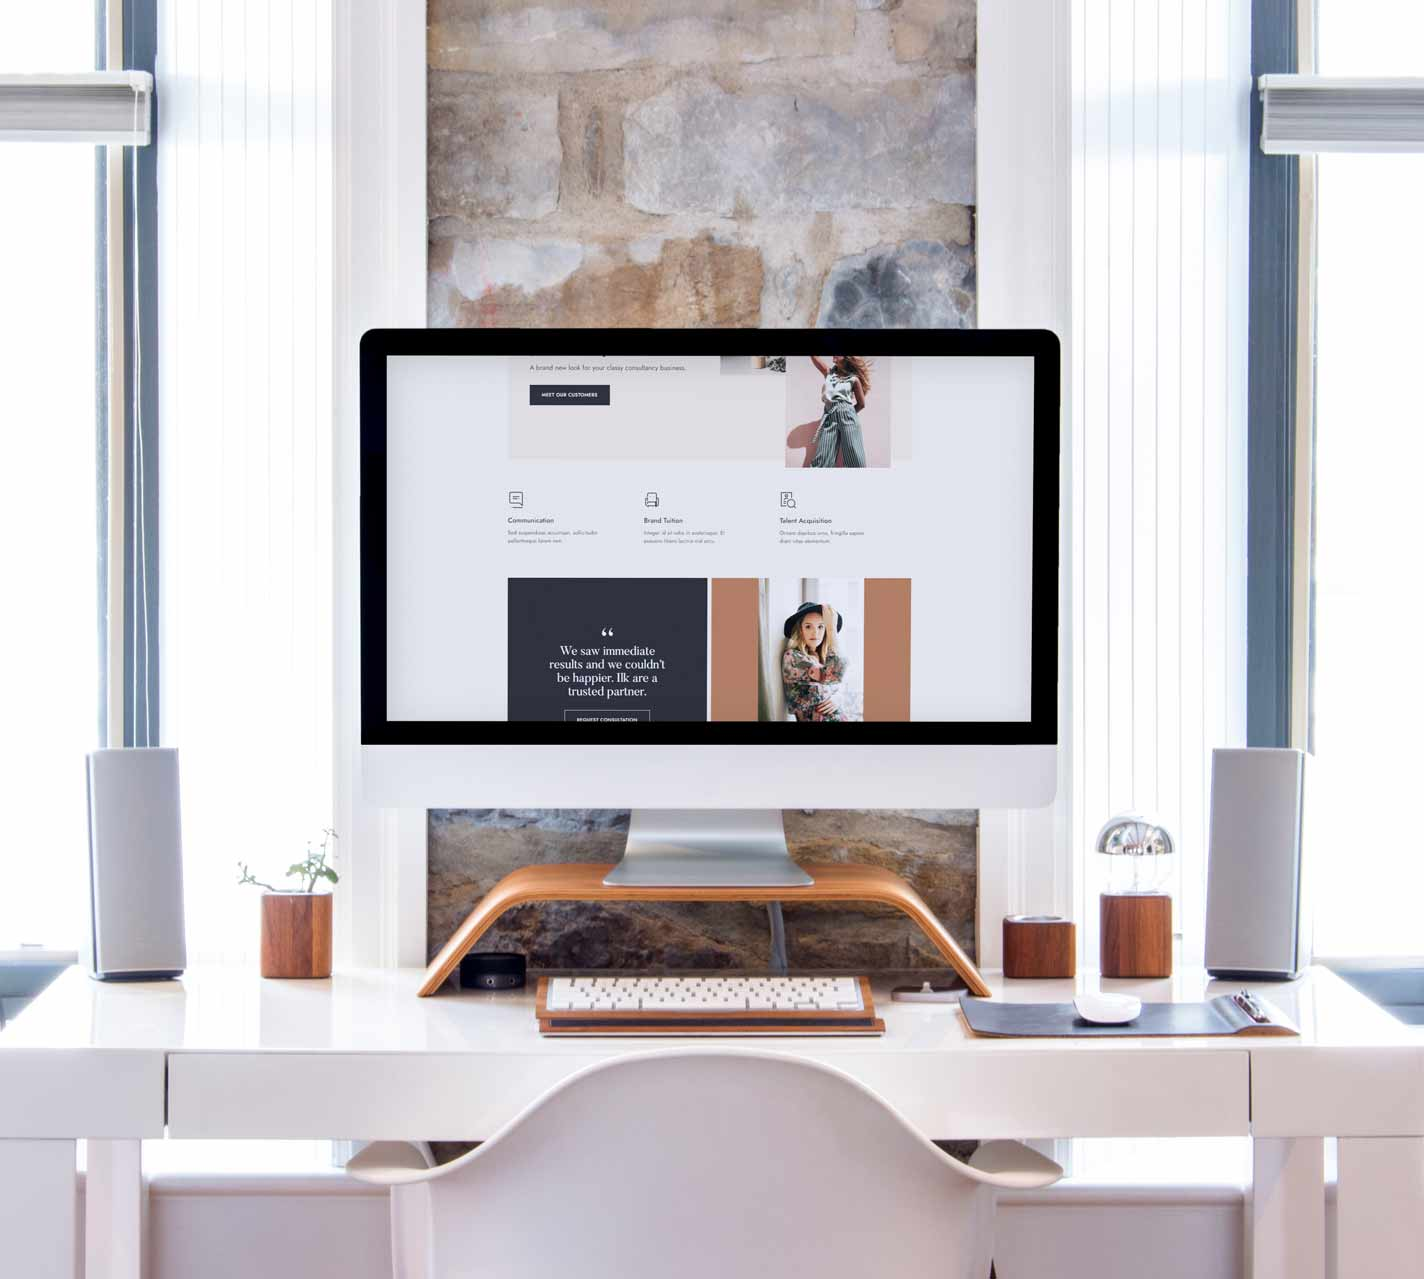 Desktop Computer Displaying an Online Store